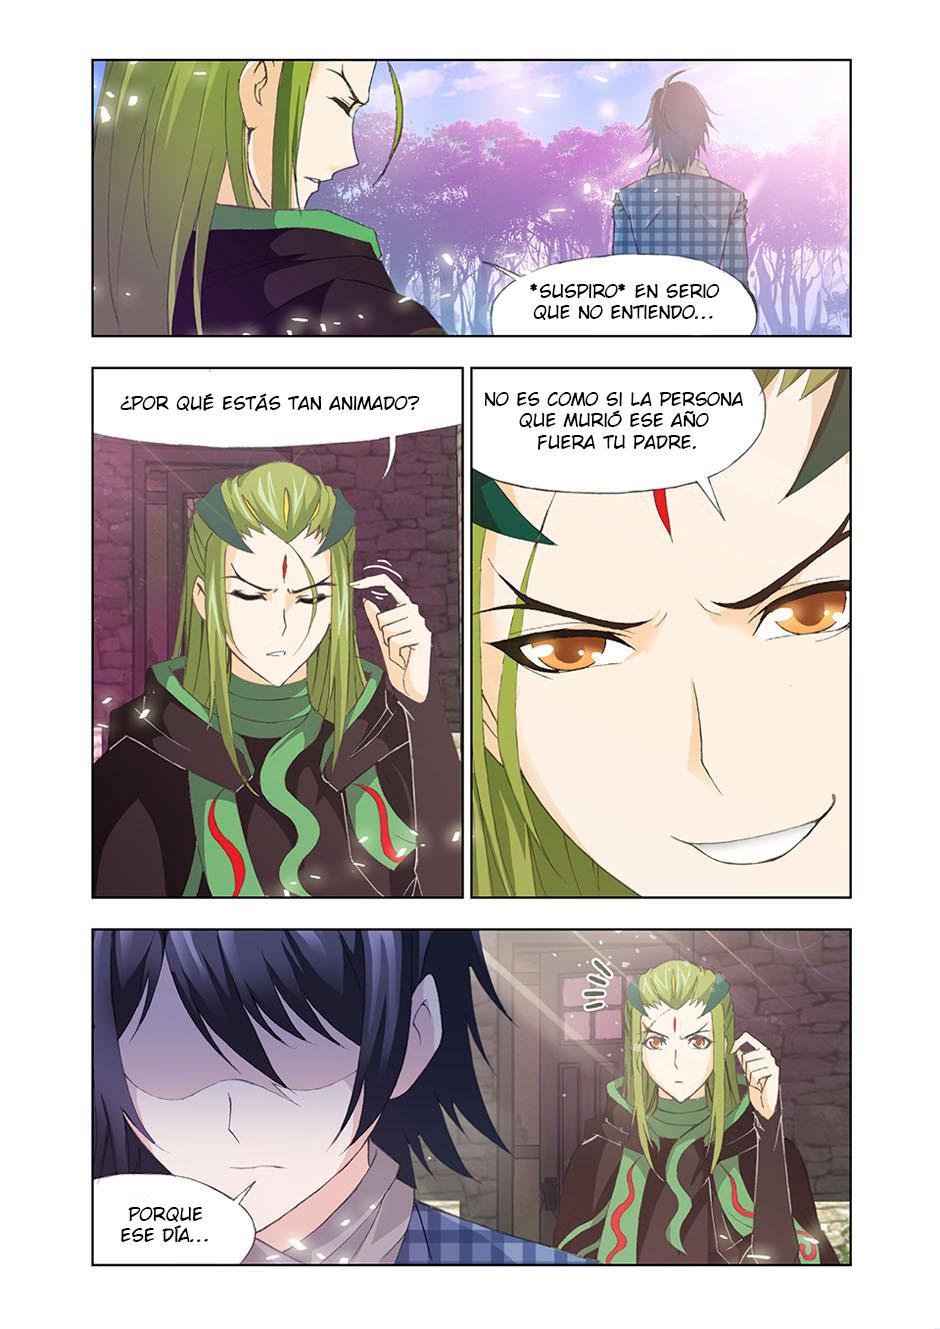 https://c5.ninemanga.com/es_manga/18/16210/417006/d6a6daf009db962b614822fceec0e375.jpg Page 10